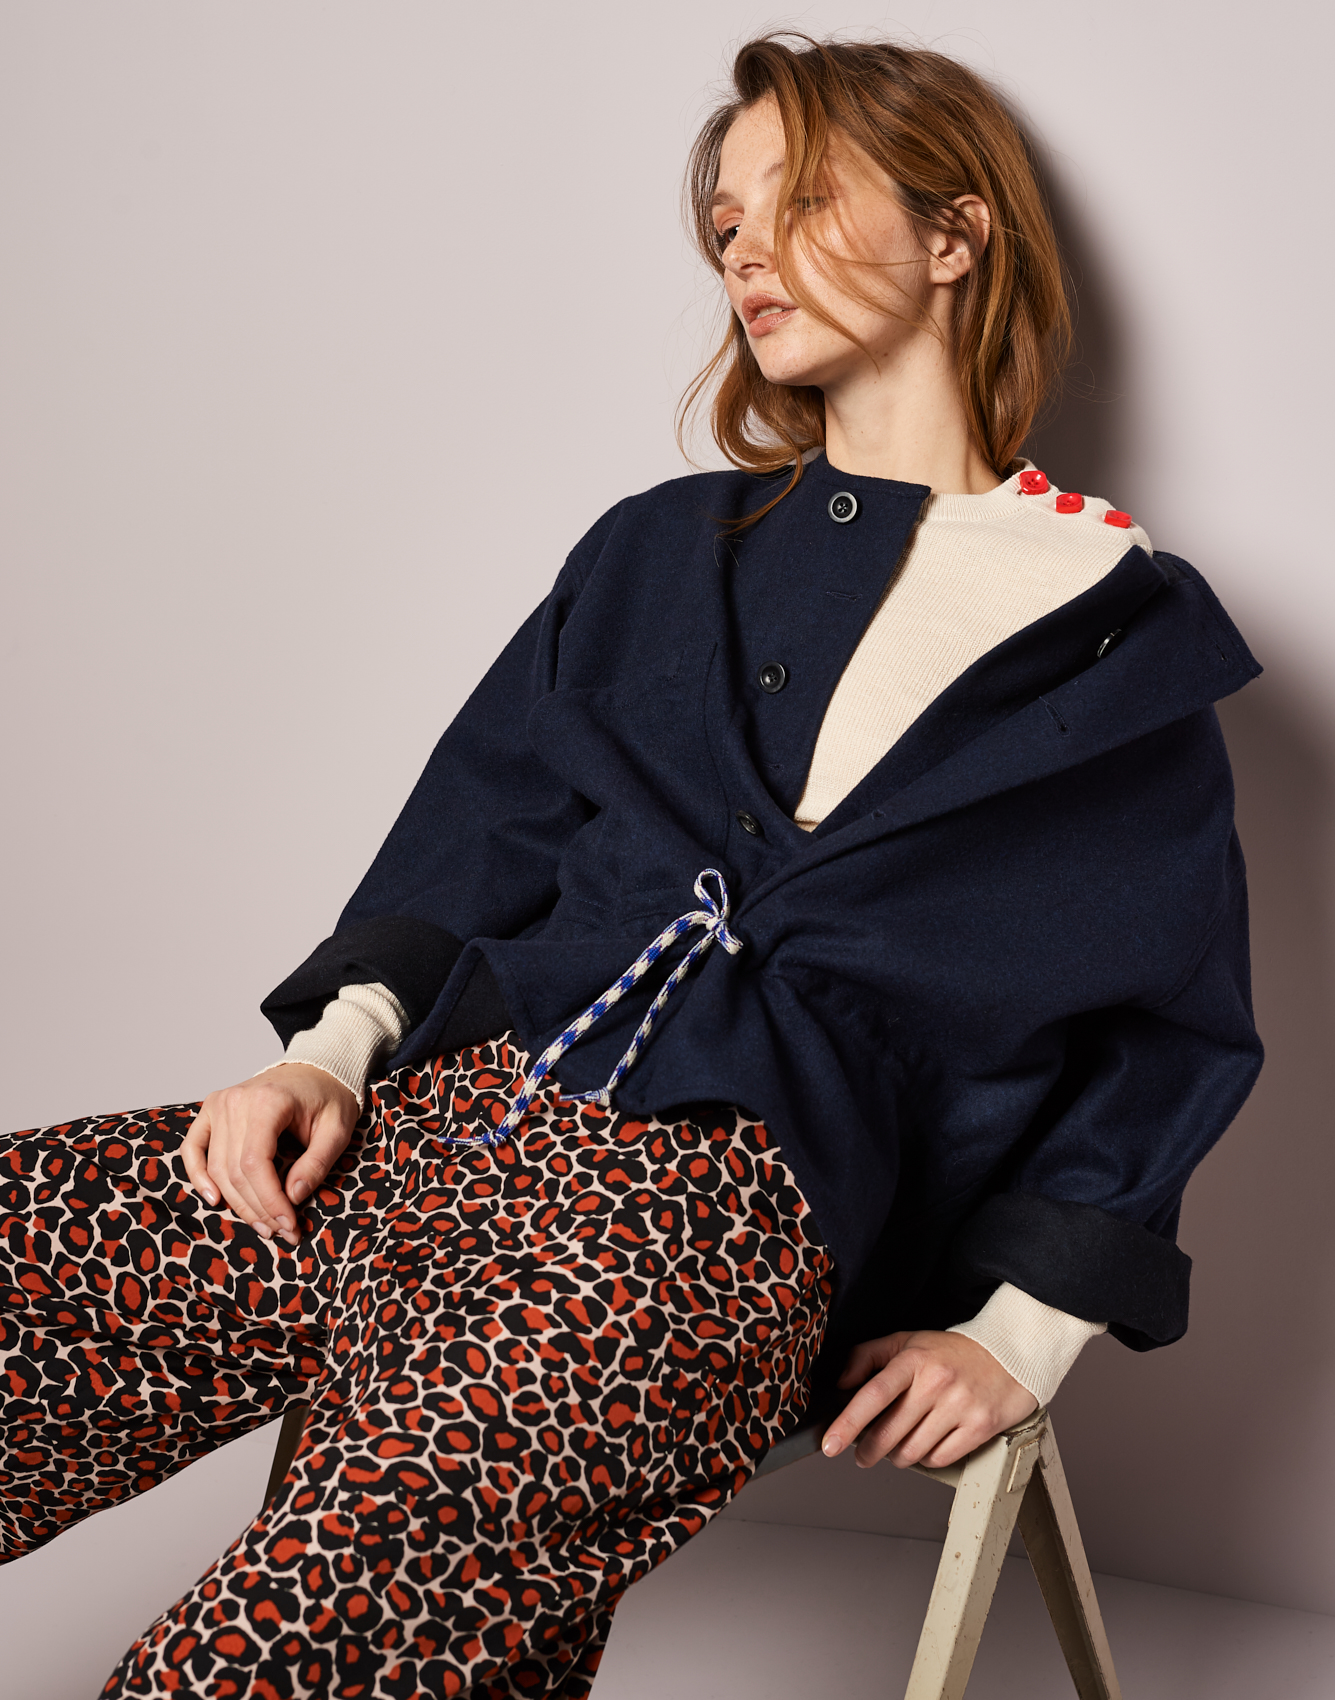 Pants Hawke  -  Jacket Laeti  -  Knitwear Gopol